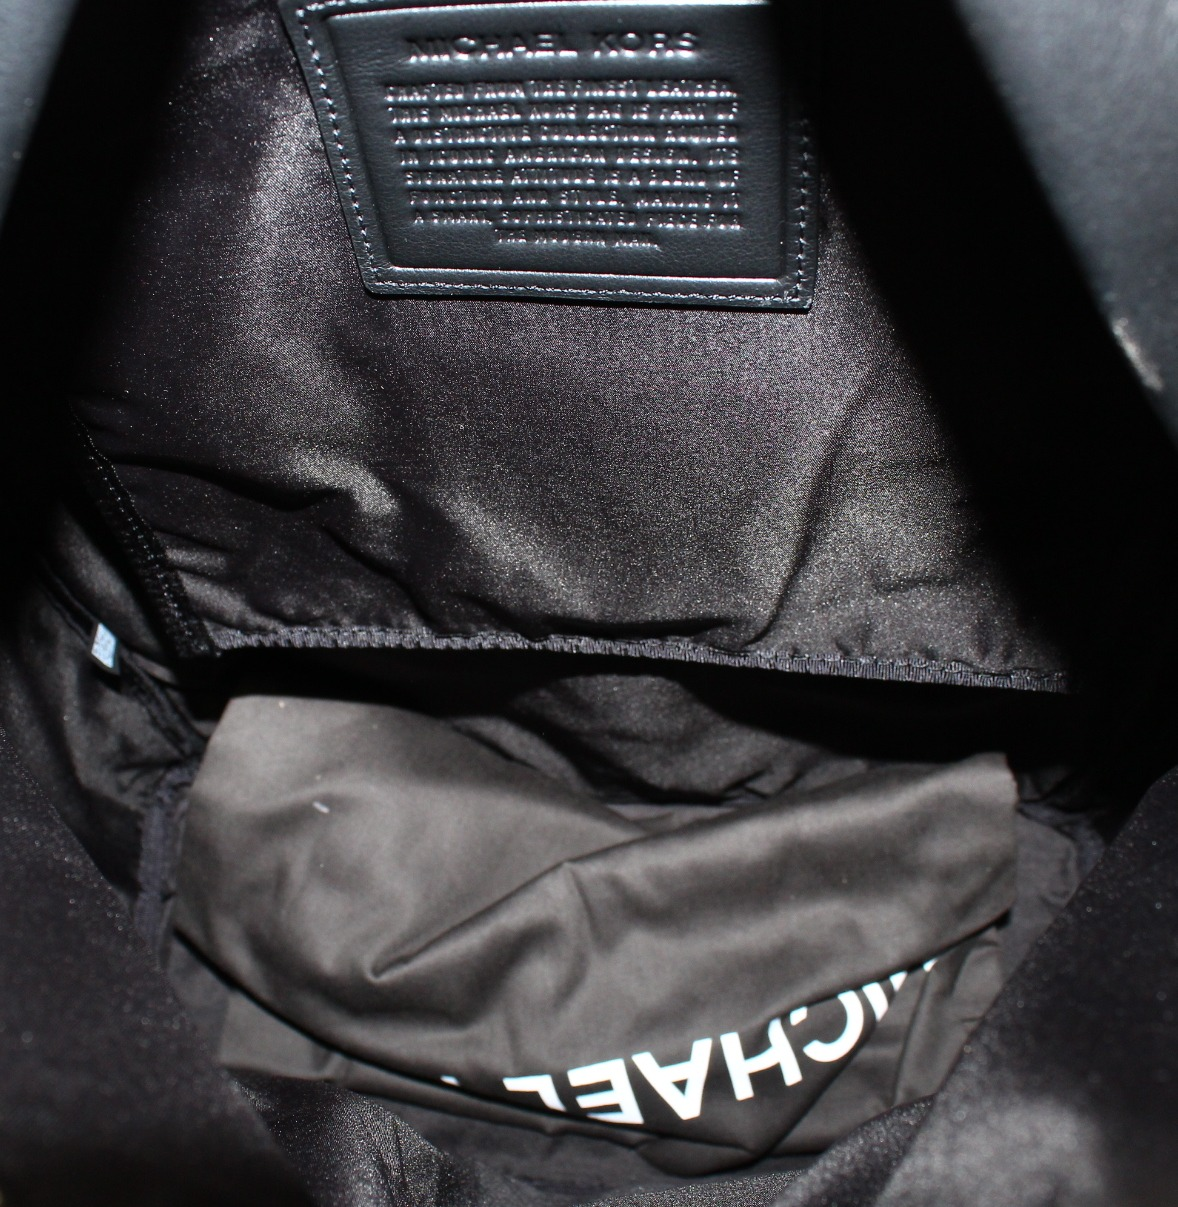 3019c39b29fc MICHAEL KORS NEW Black Pebble Leather Odin Resina Men s Backpack Bag -  Walmart.com